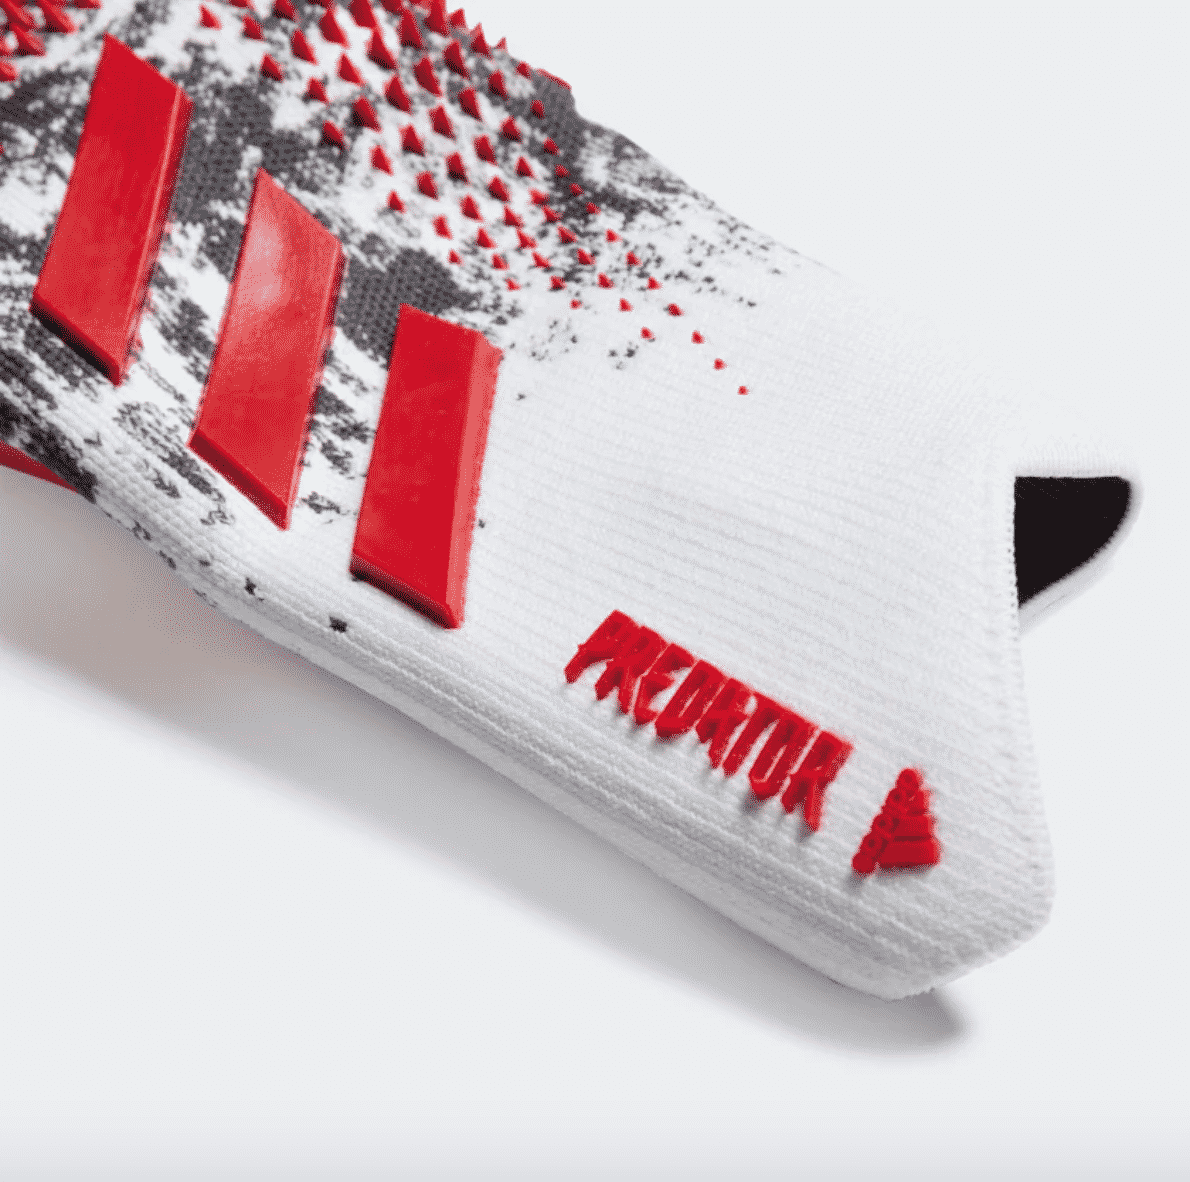 adidas-gants-gardien-manuel-neur-adidas-predator-20-2